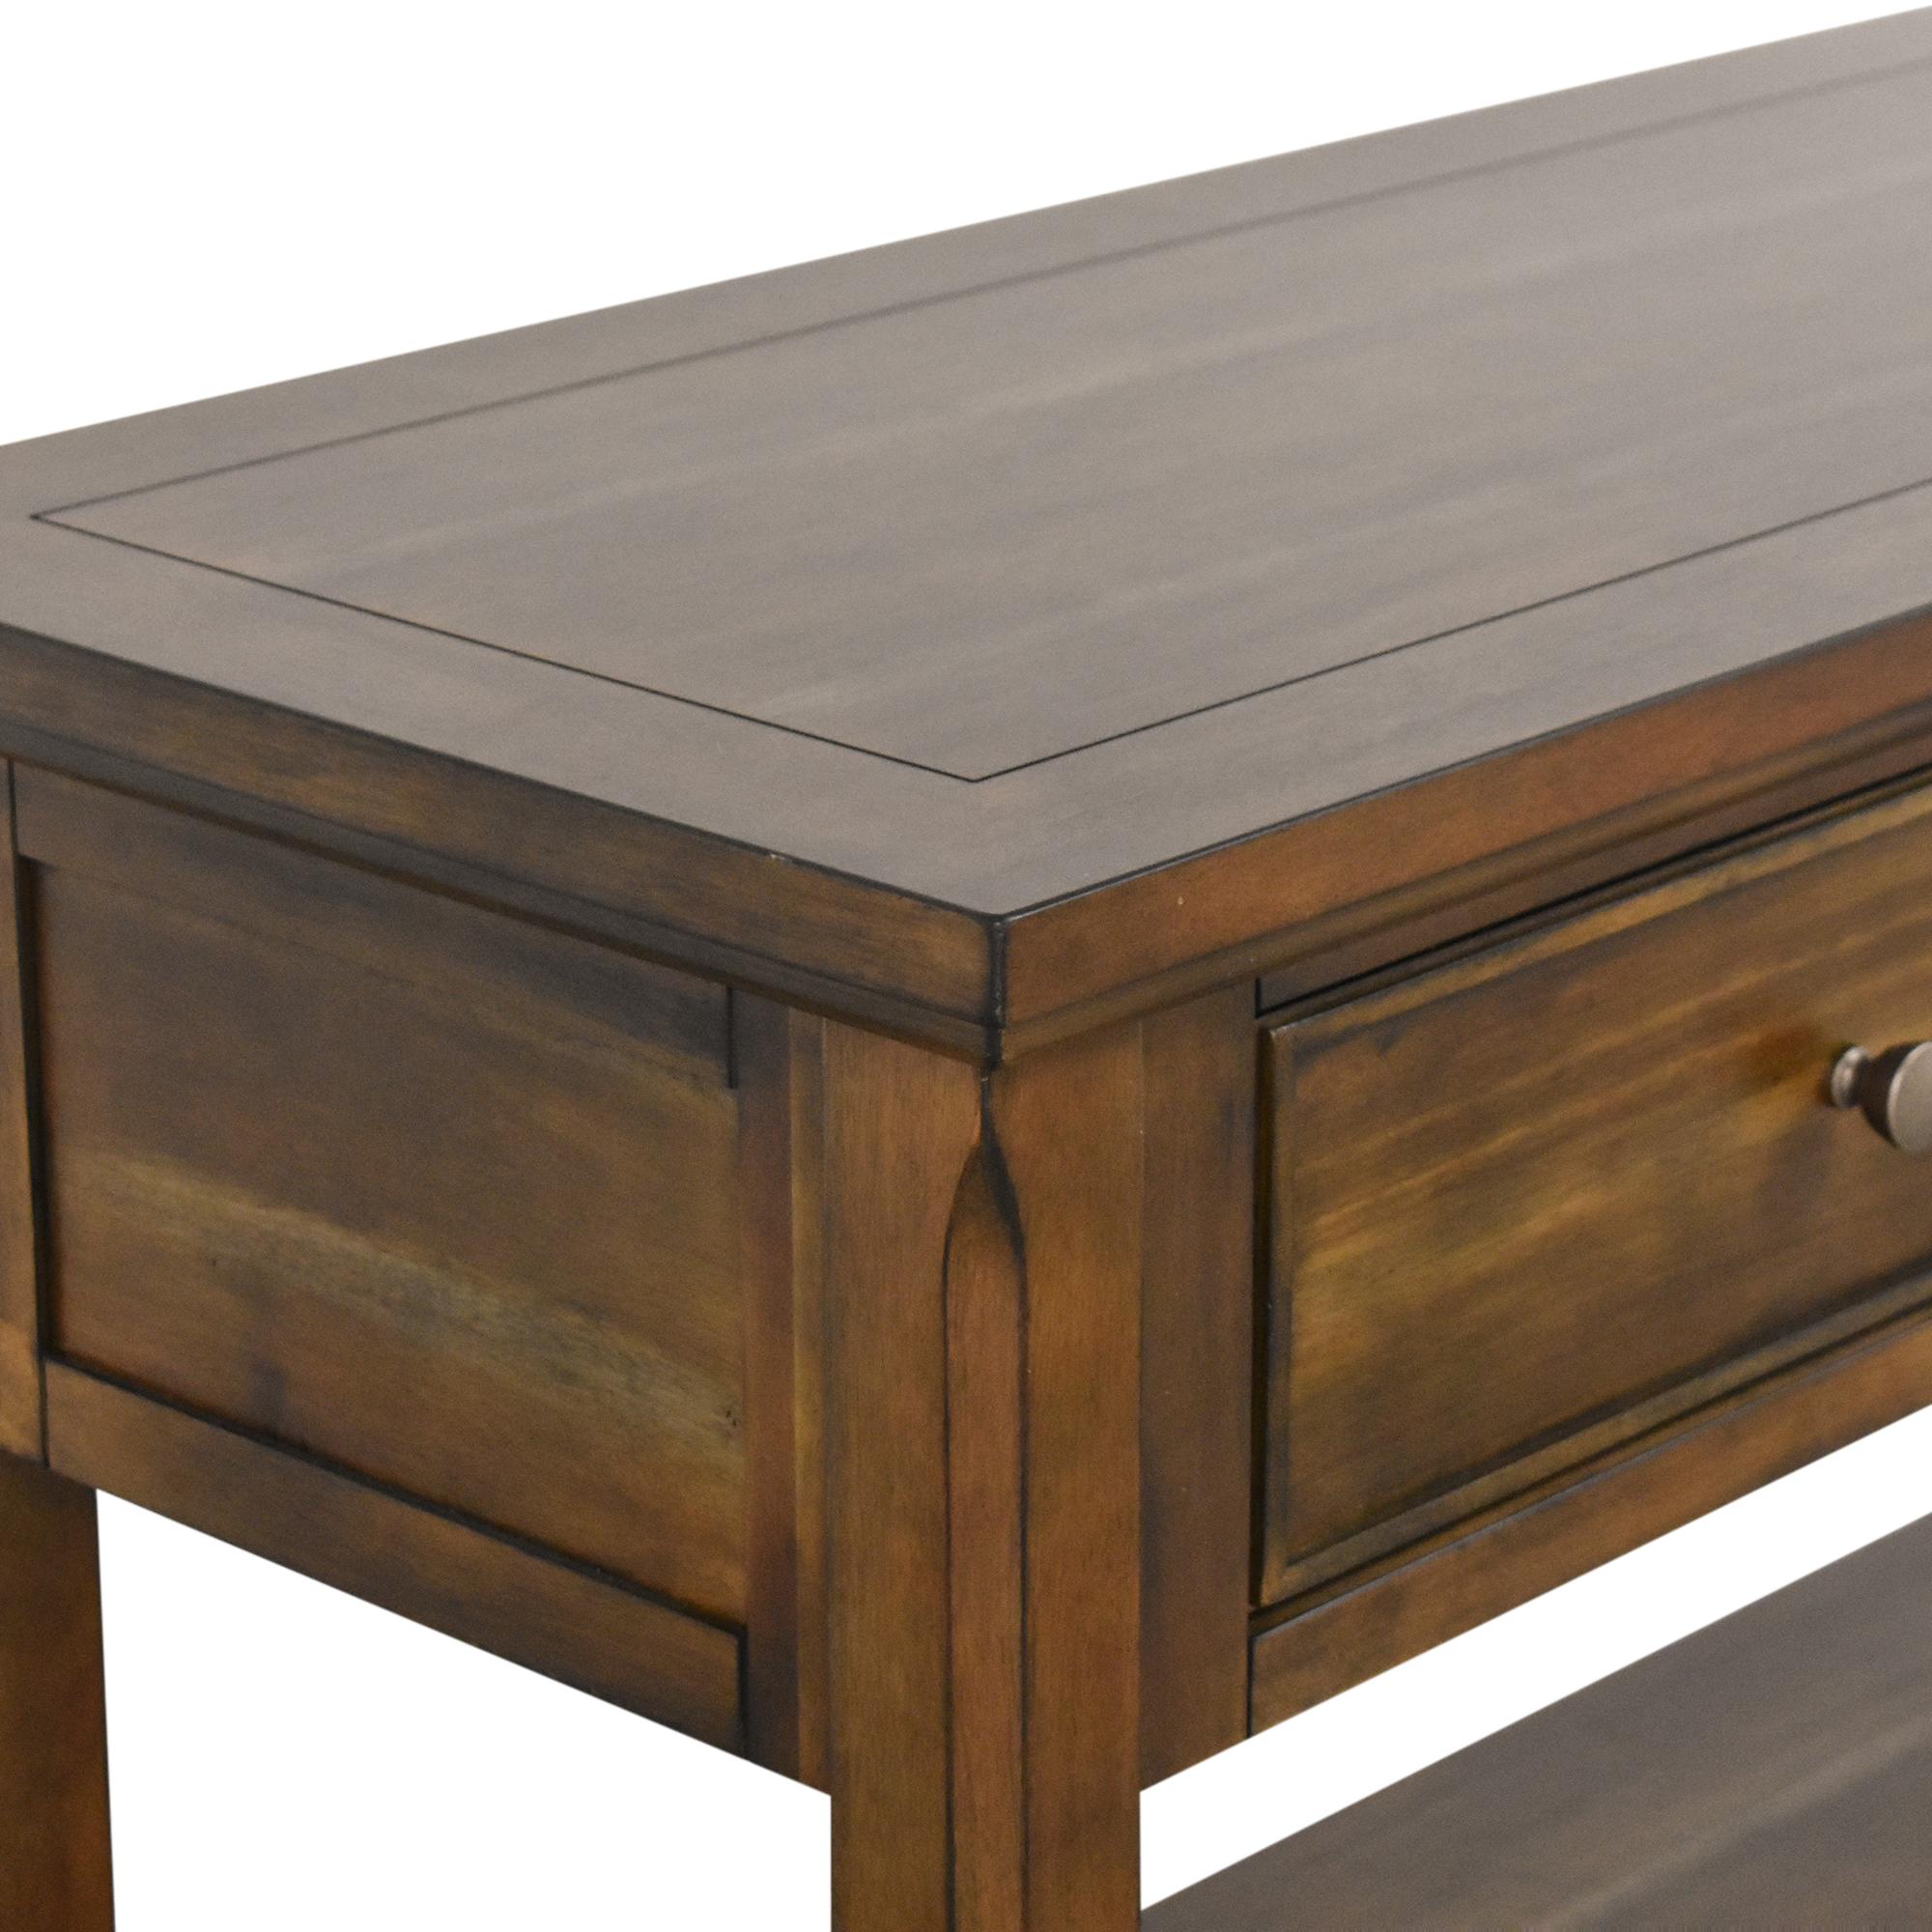 Ashley Furniture Ashley Furniture Porter Console Table price